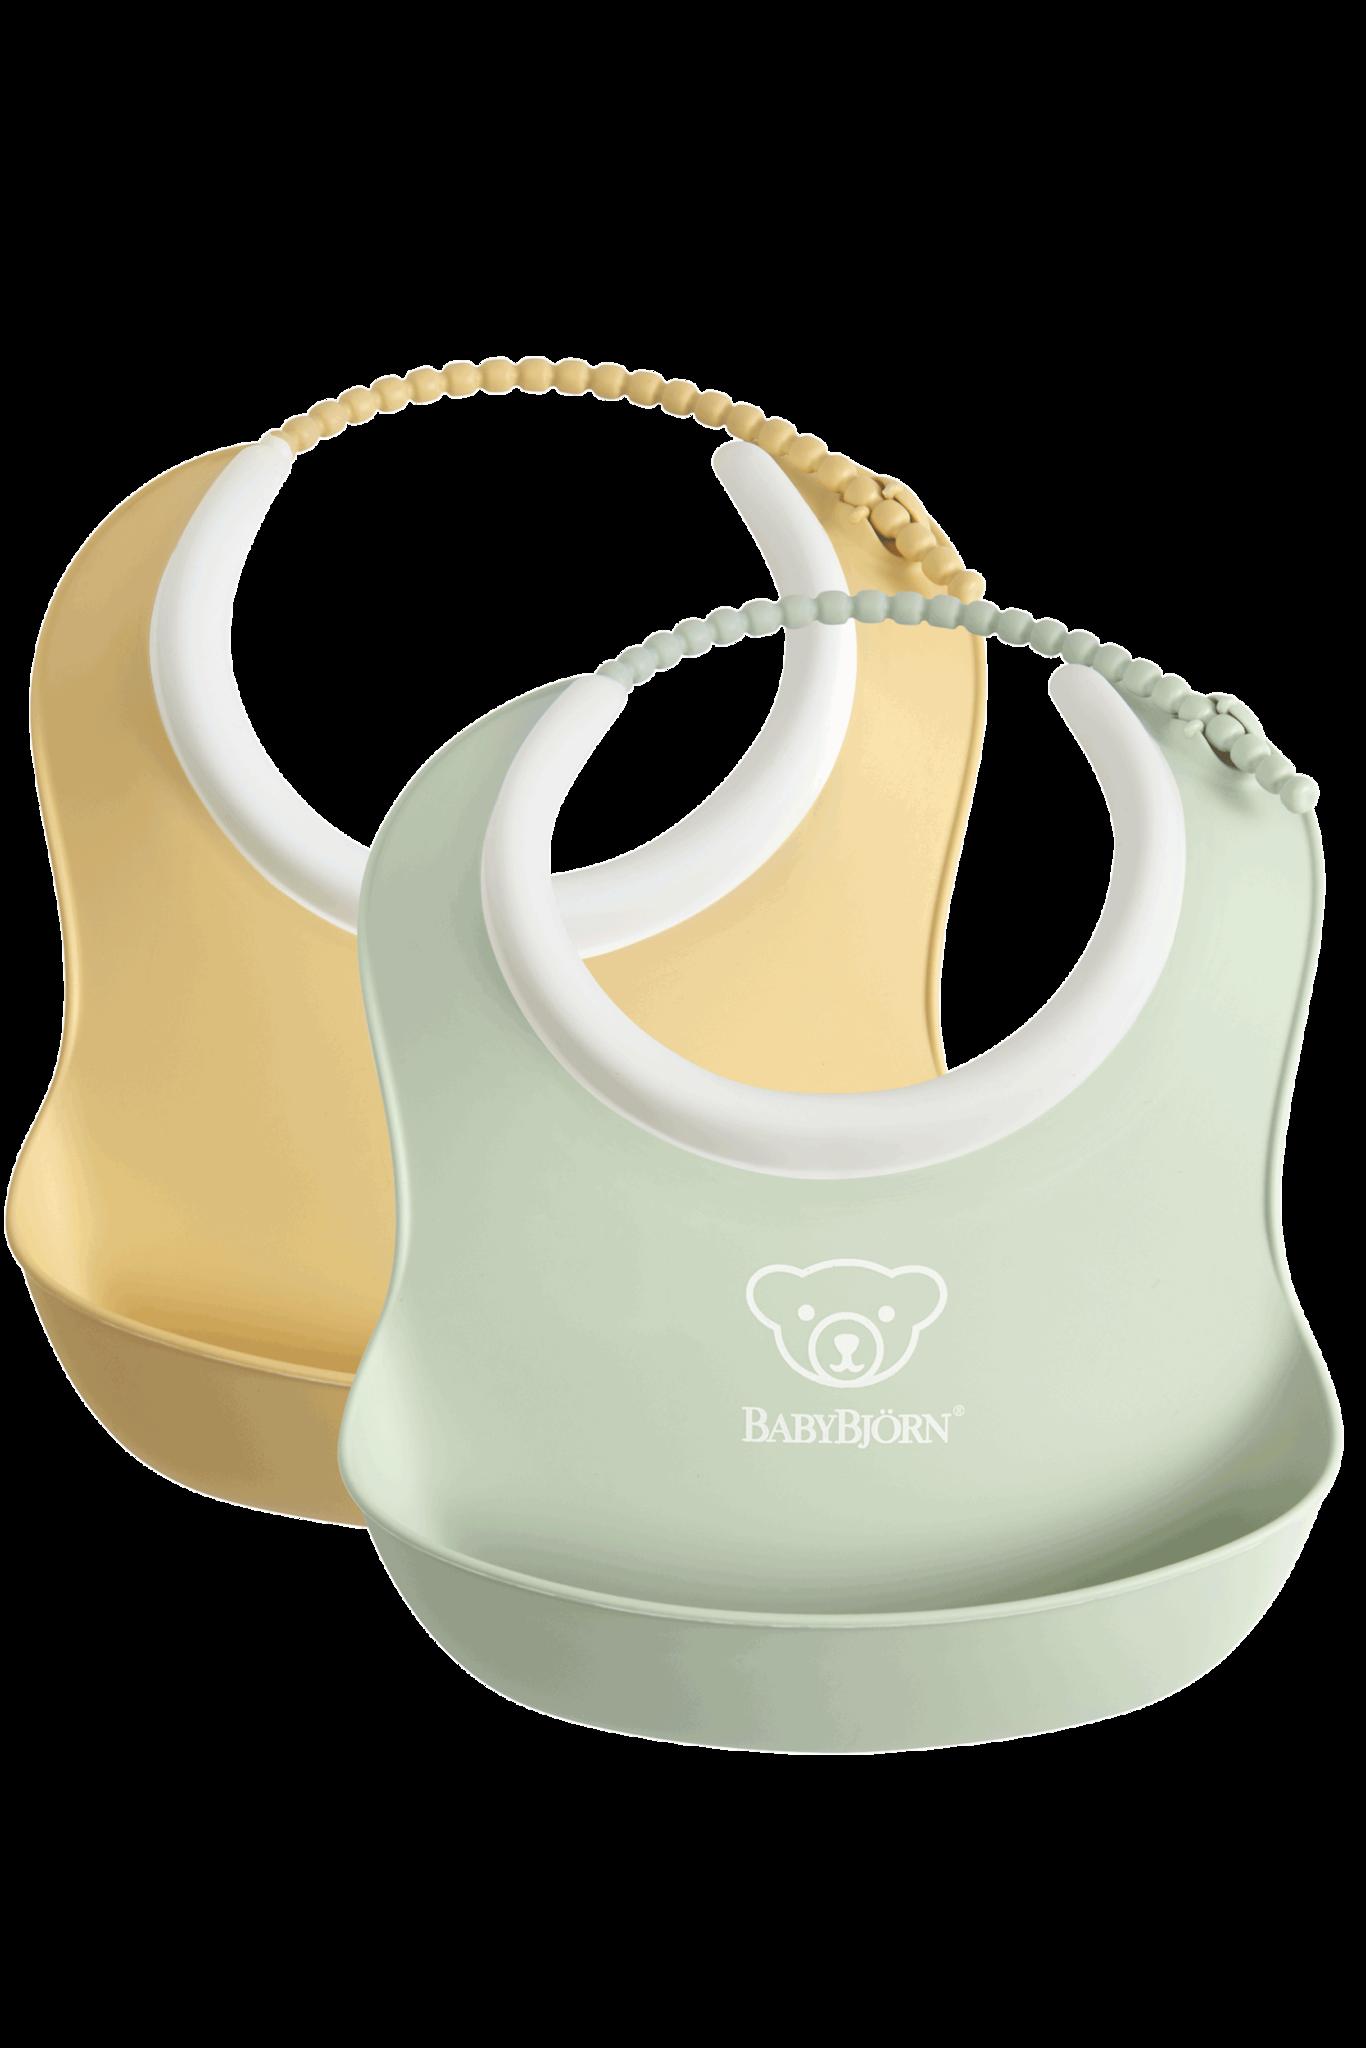 BABYBJÖRN Baby Slabbetje klein duopack Pastelgeel/Pastelgroen